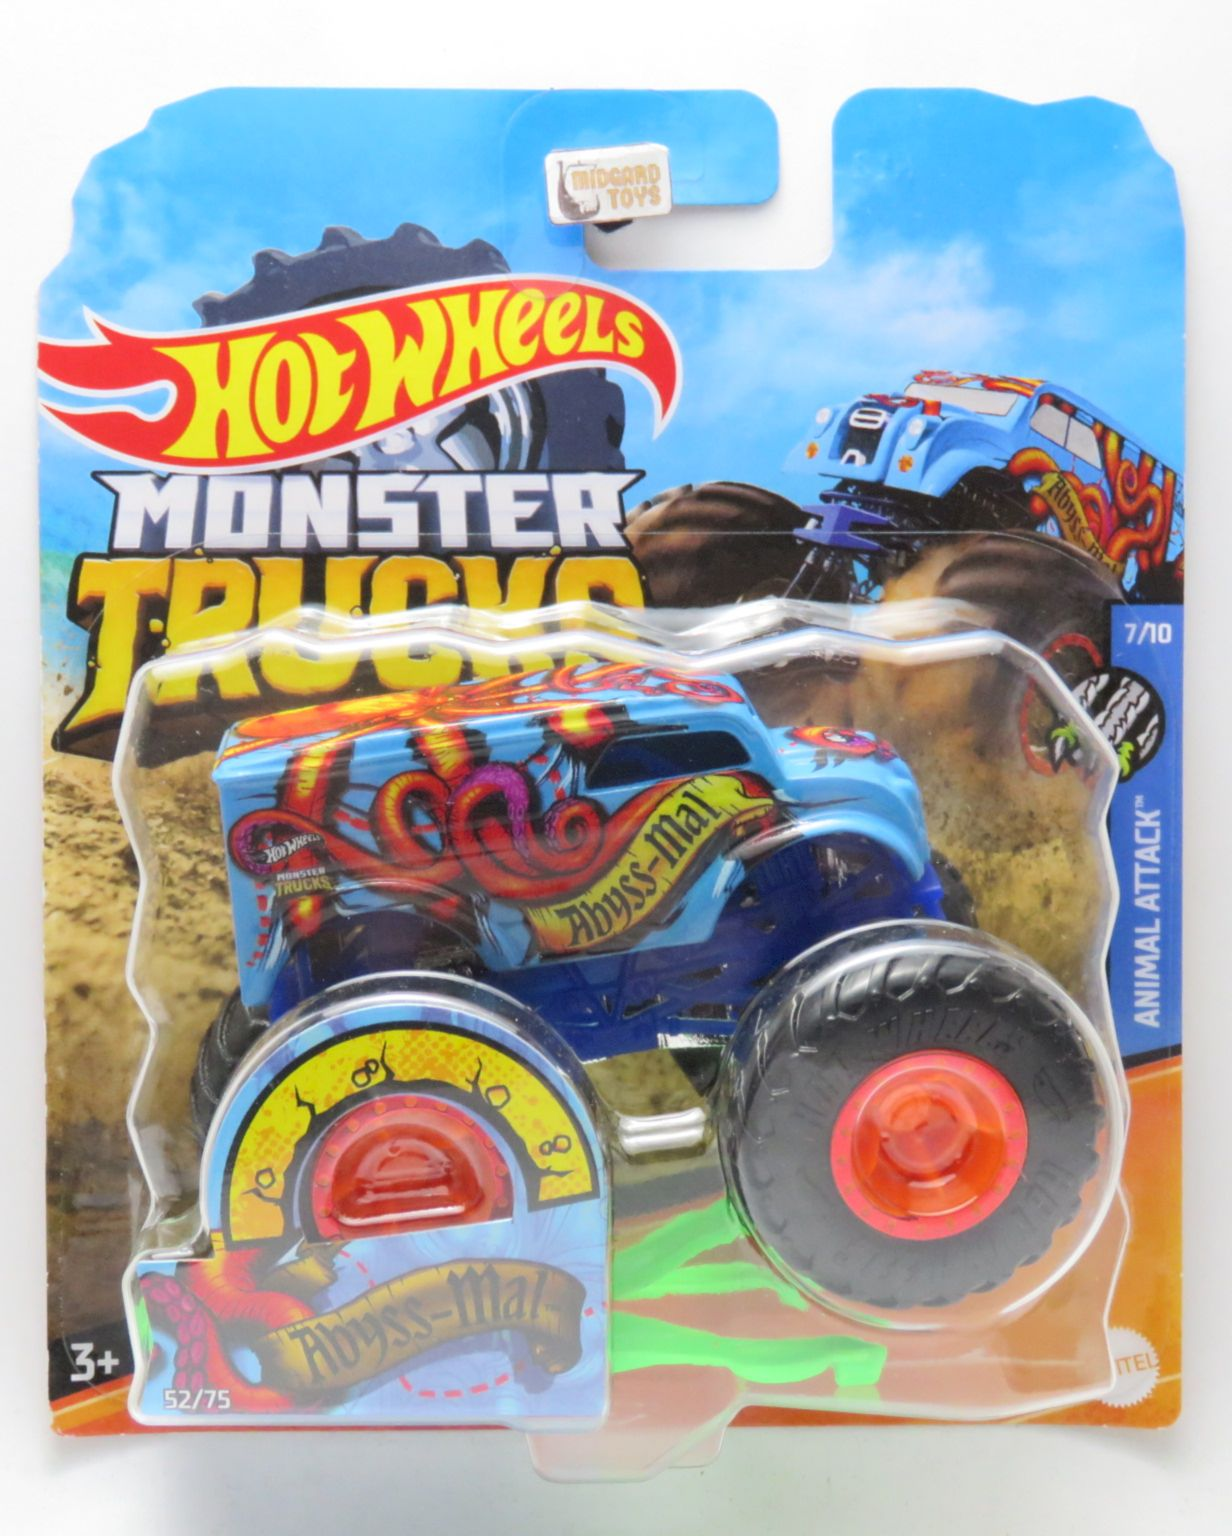 Midgard Toys Os Melhores Artigos De Todo O Reino Monster Trucks Abyss Mal 52 1 64 Hot Wheels